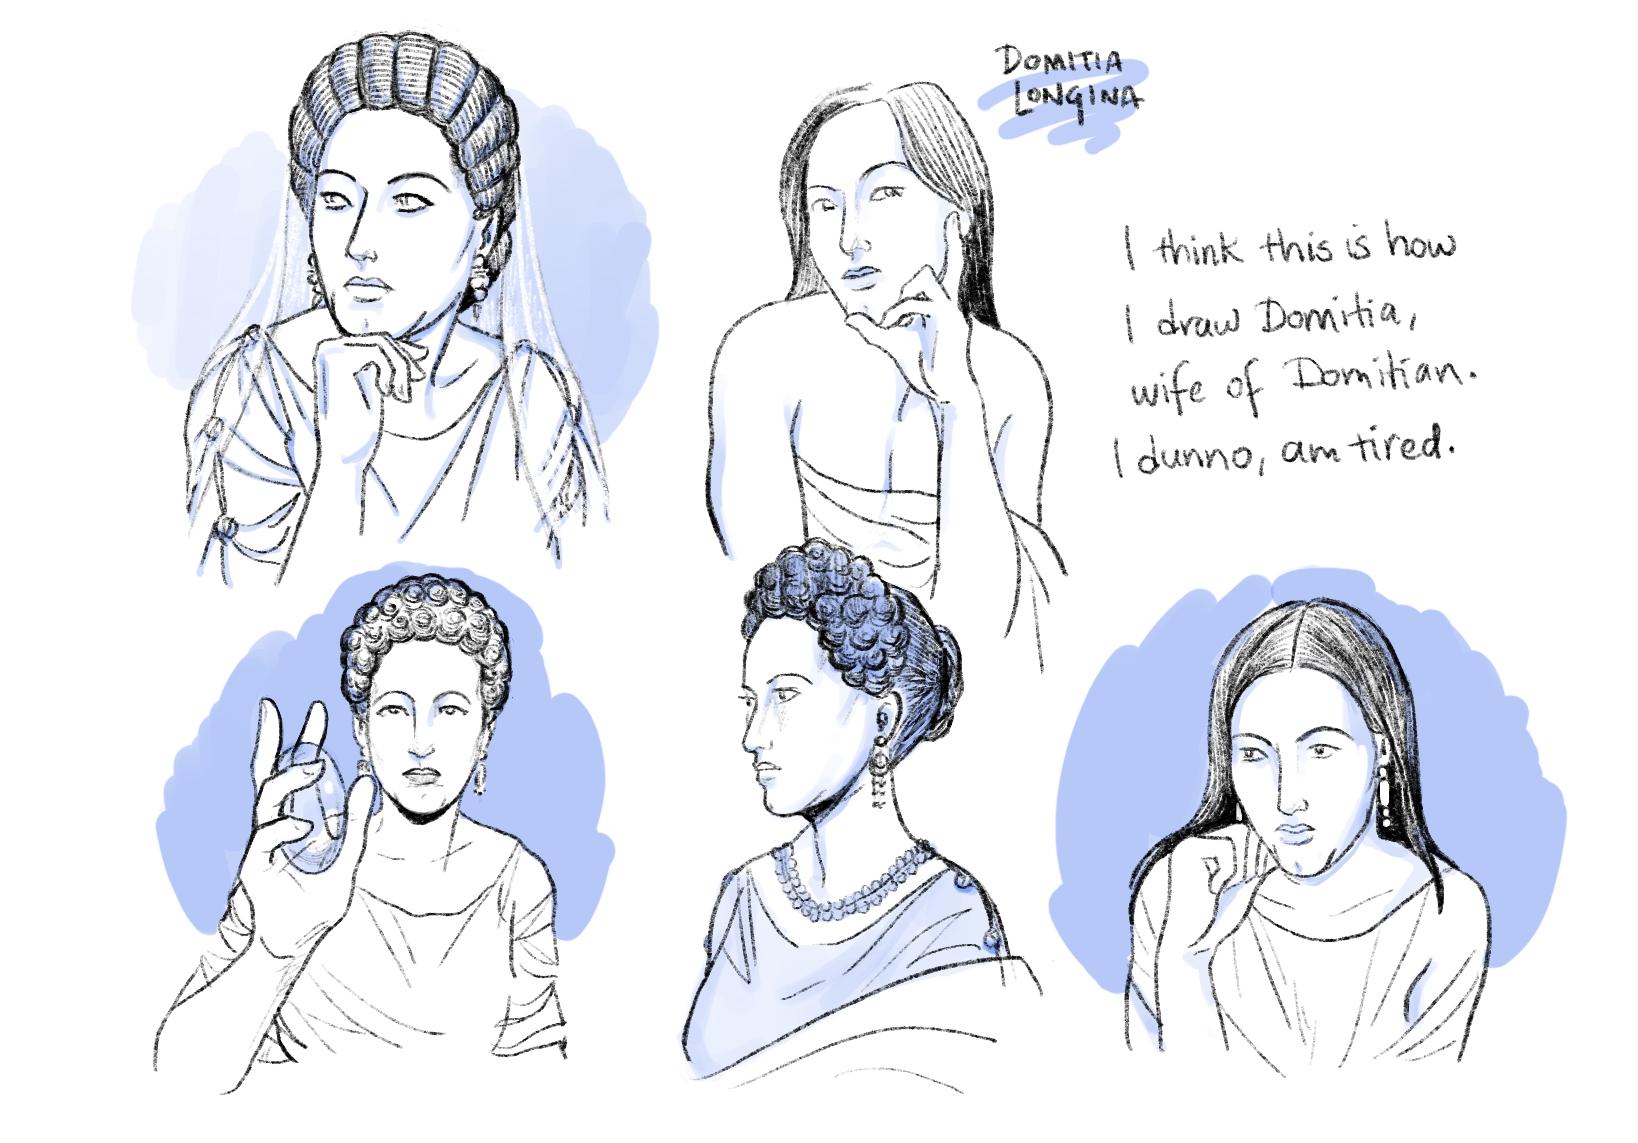 Head study: Domitia Longina